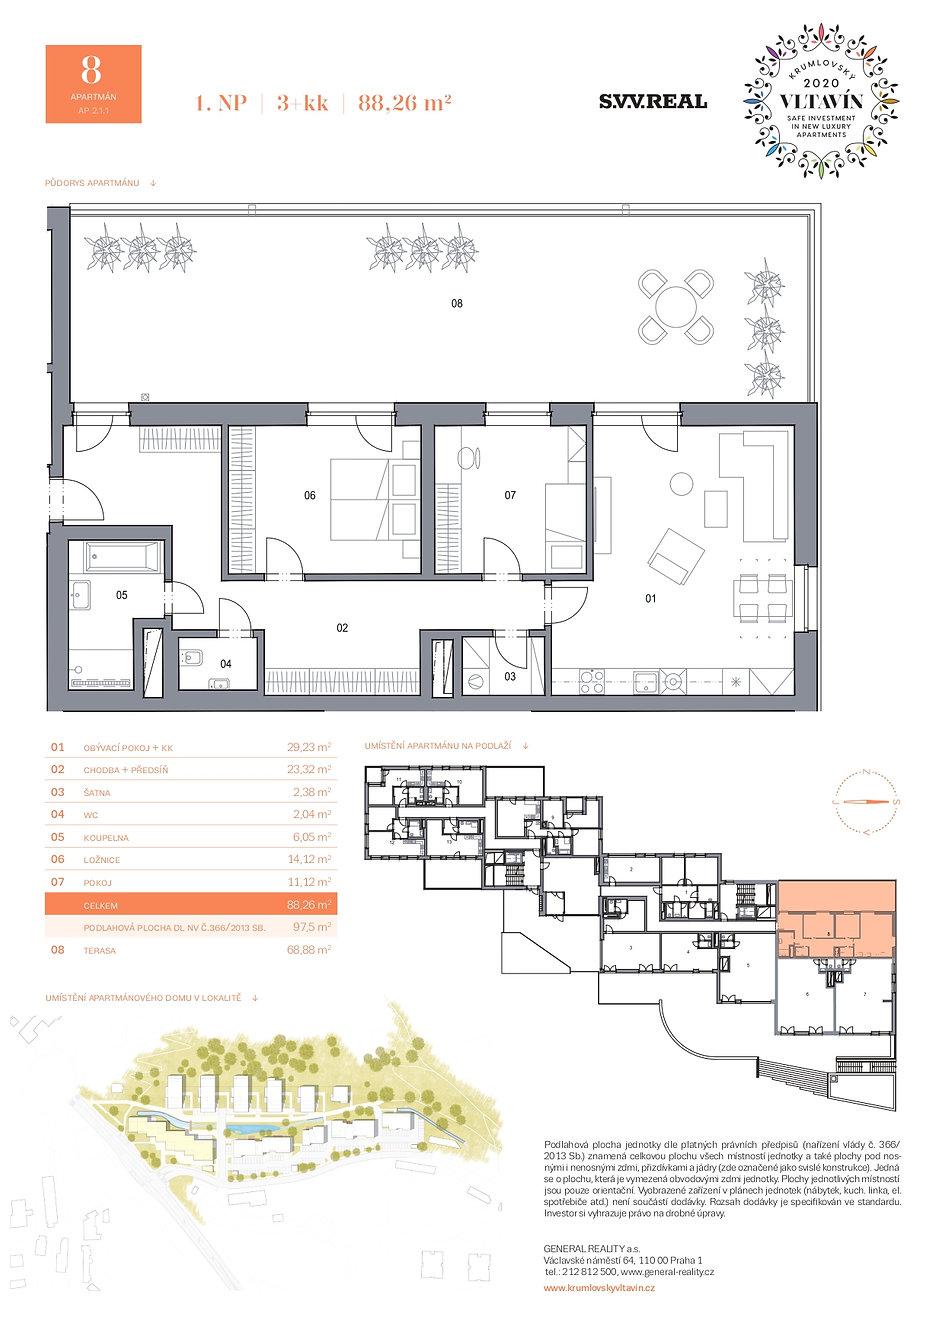 GR_krumlovsky-vltavin_bytove-karty-apartmany_1NP_A08_page-0001.jpg